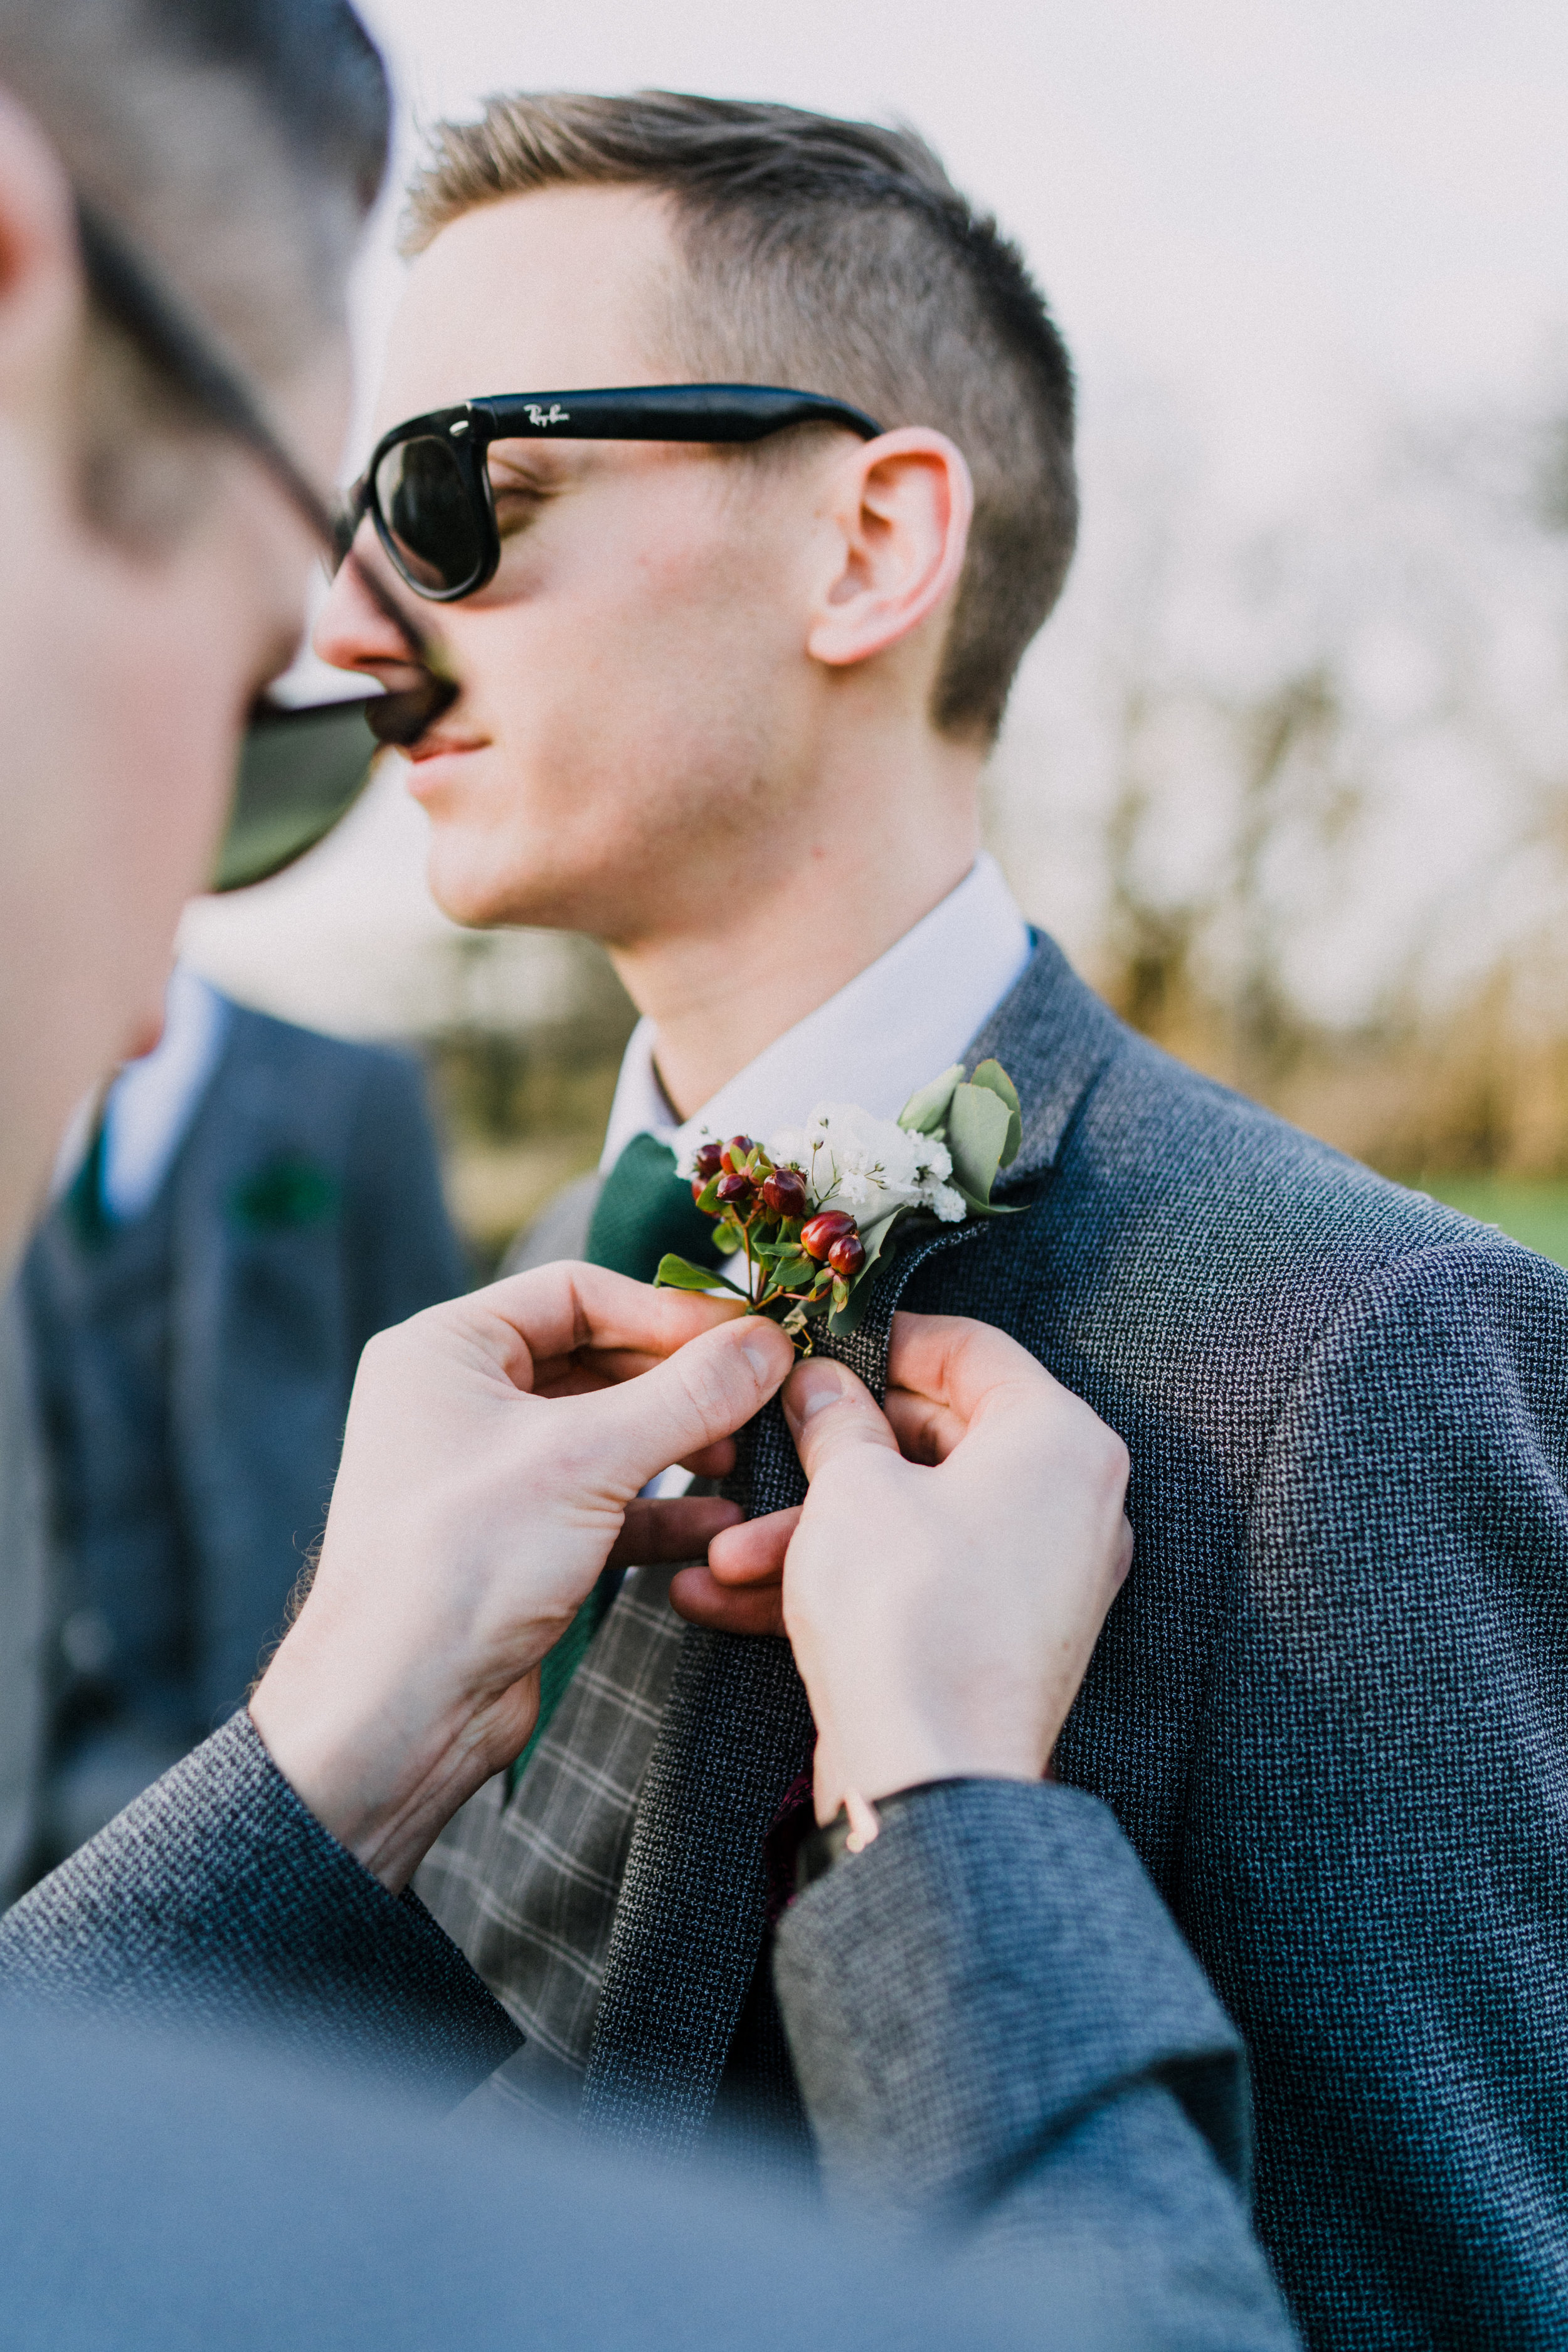 larchfield estate wedding, wedding venues northern ireland, barn wedding venues northern ireland, quirky weddings northern ireland, 5 star wedding venues northern ireland, wedding getting ready (16).jpg